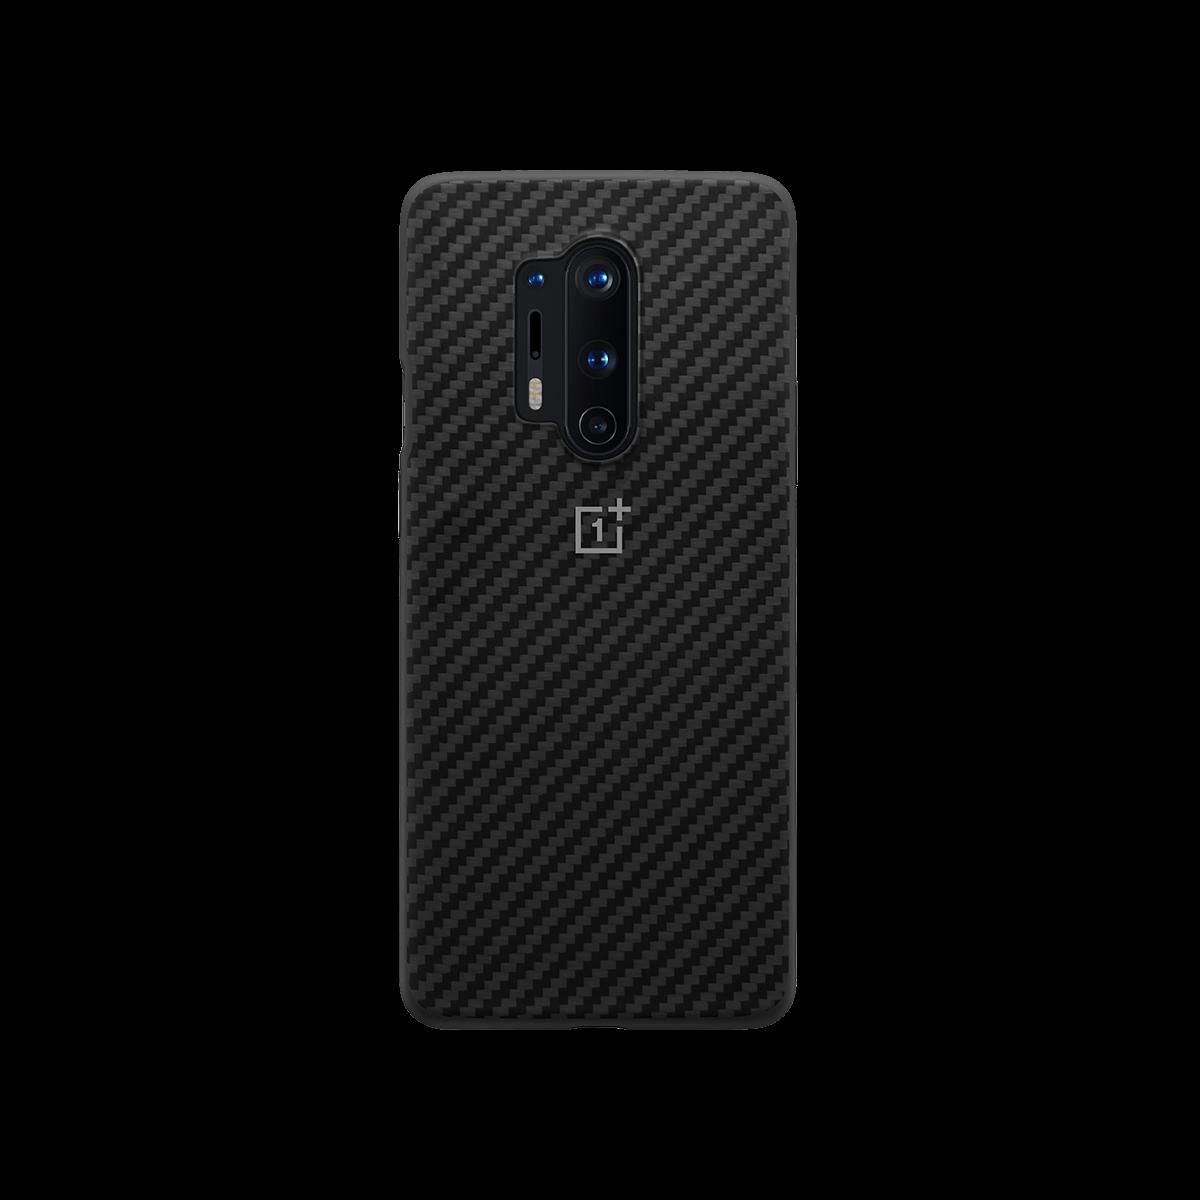 Oneplus 8 Pro Karbon Bumper Case Oneplus Phone Accessories